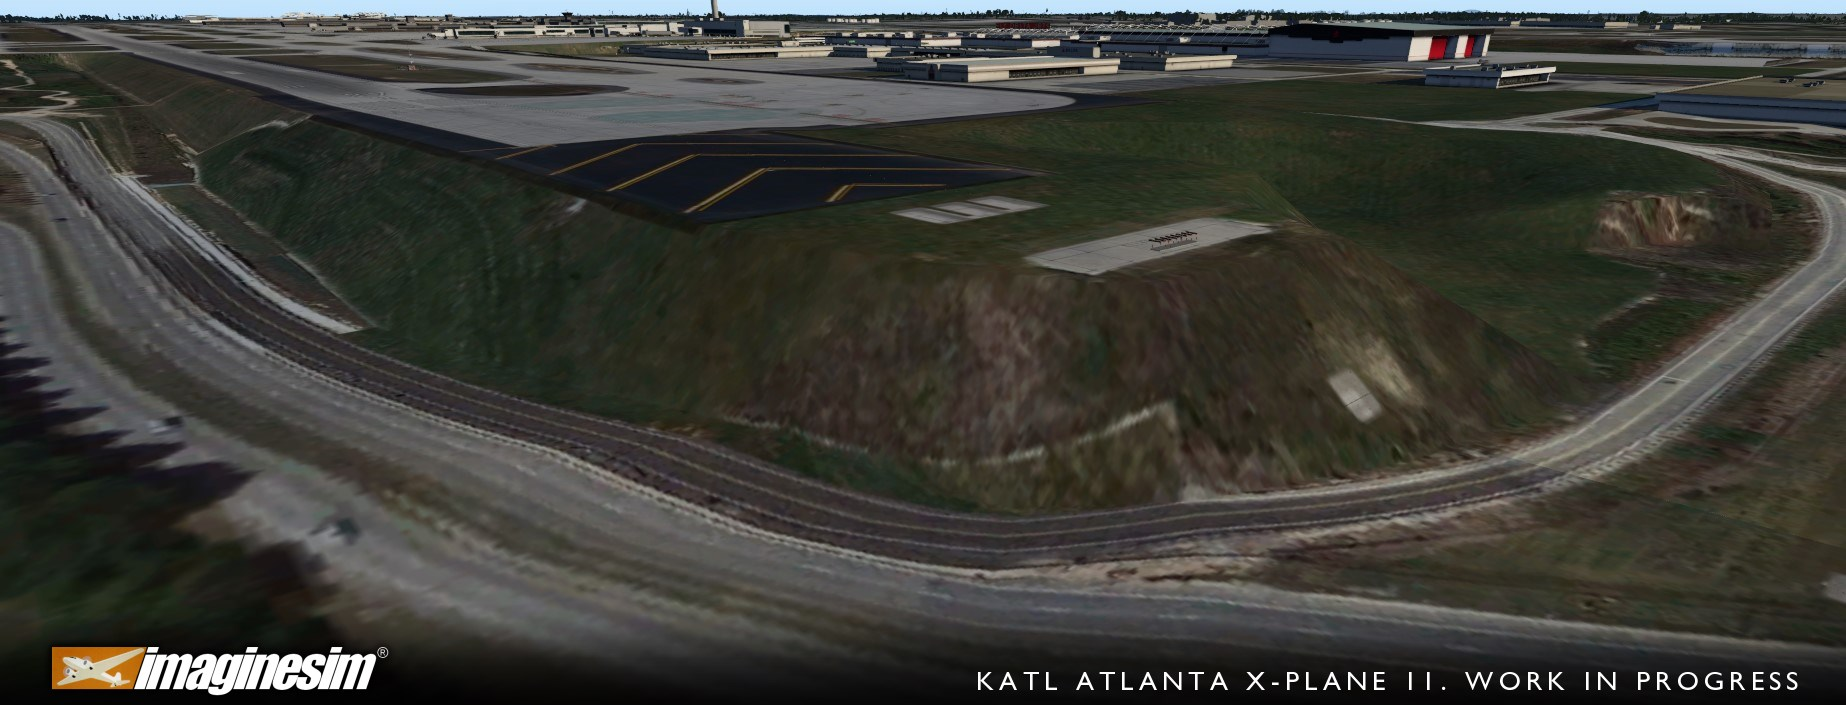 imaginesim-xplane-atlanta-katl.jpg